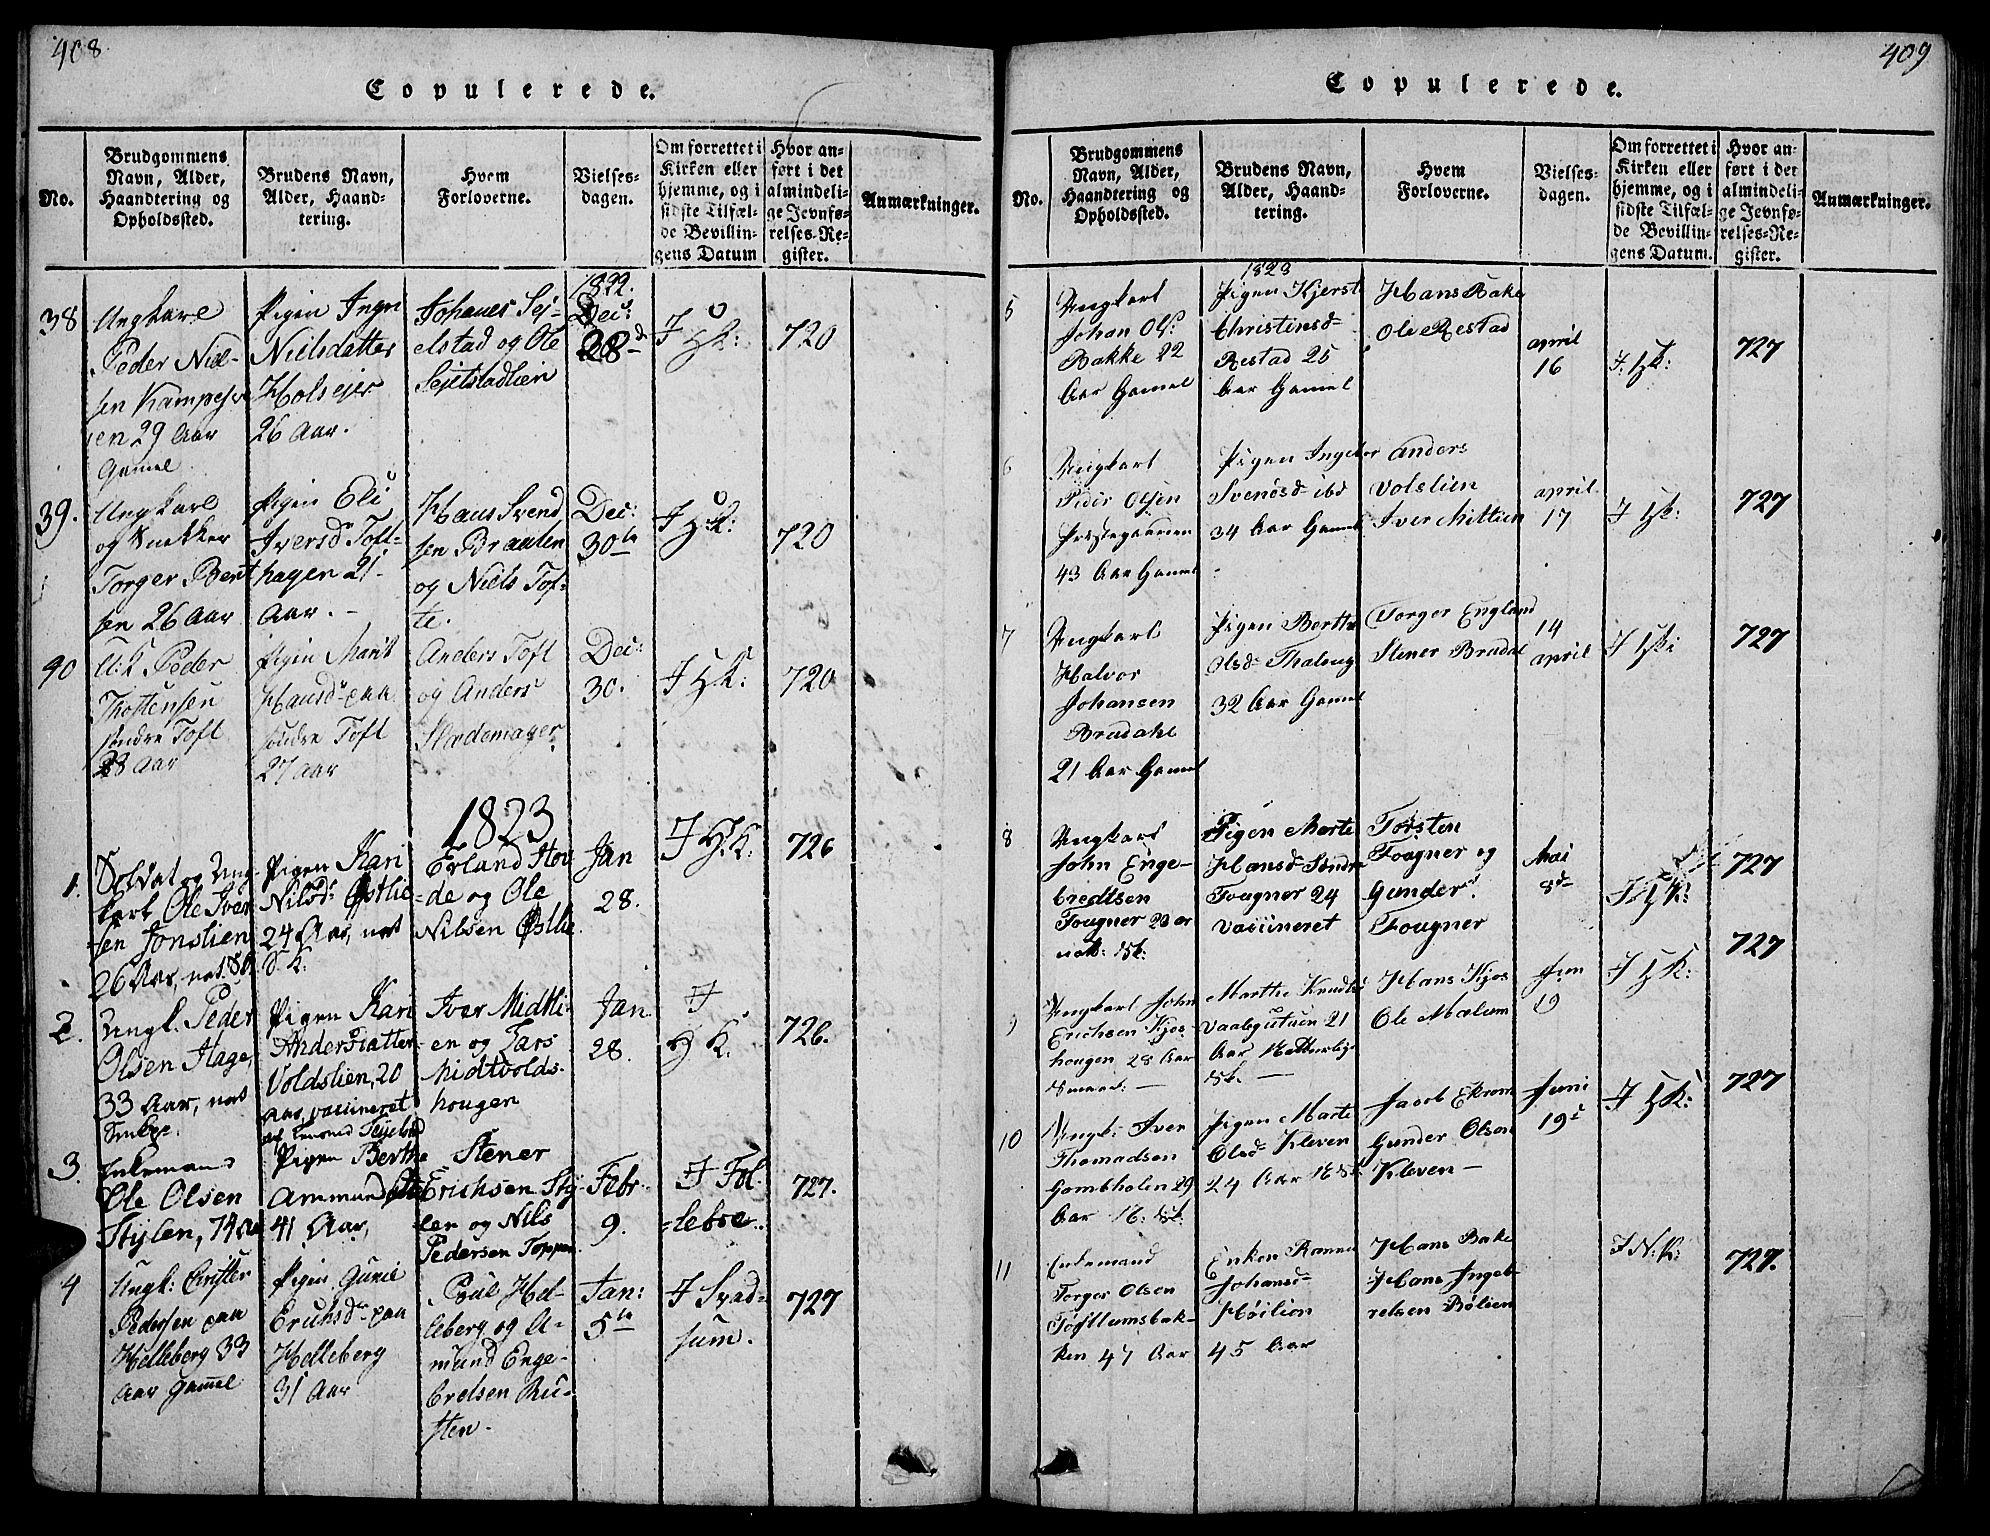 SAH, Gausdal prestekontor, Ministerialbok nr. 5, 1817-1829, s. 408-409